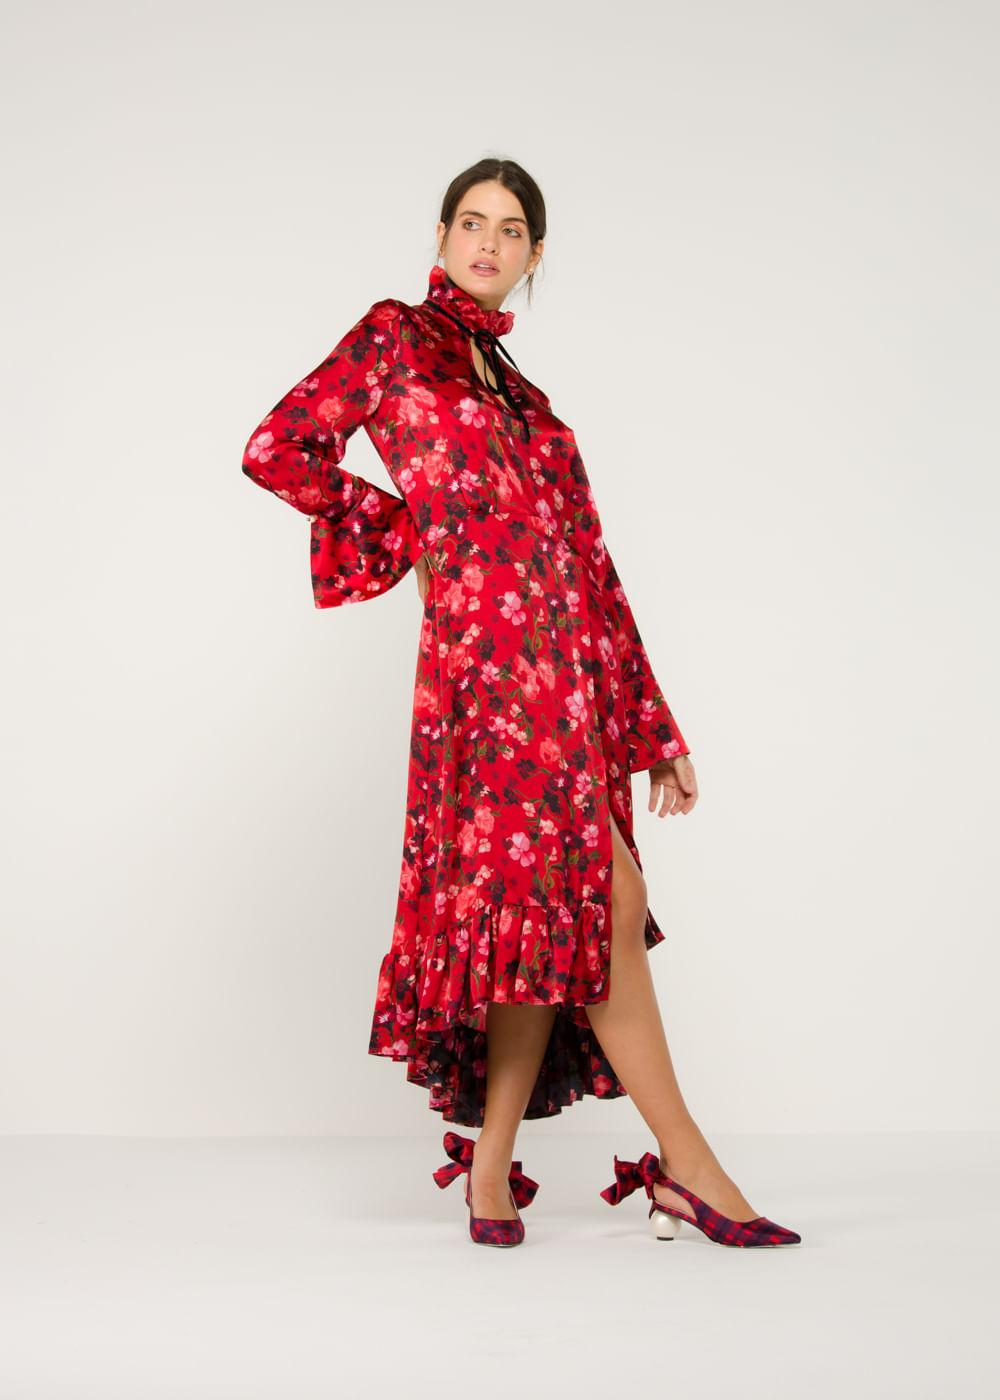 Vestido Longo De Seda Adelaide Floral Vermelha 8 Uk